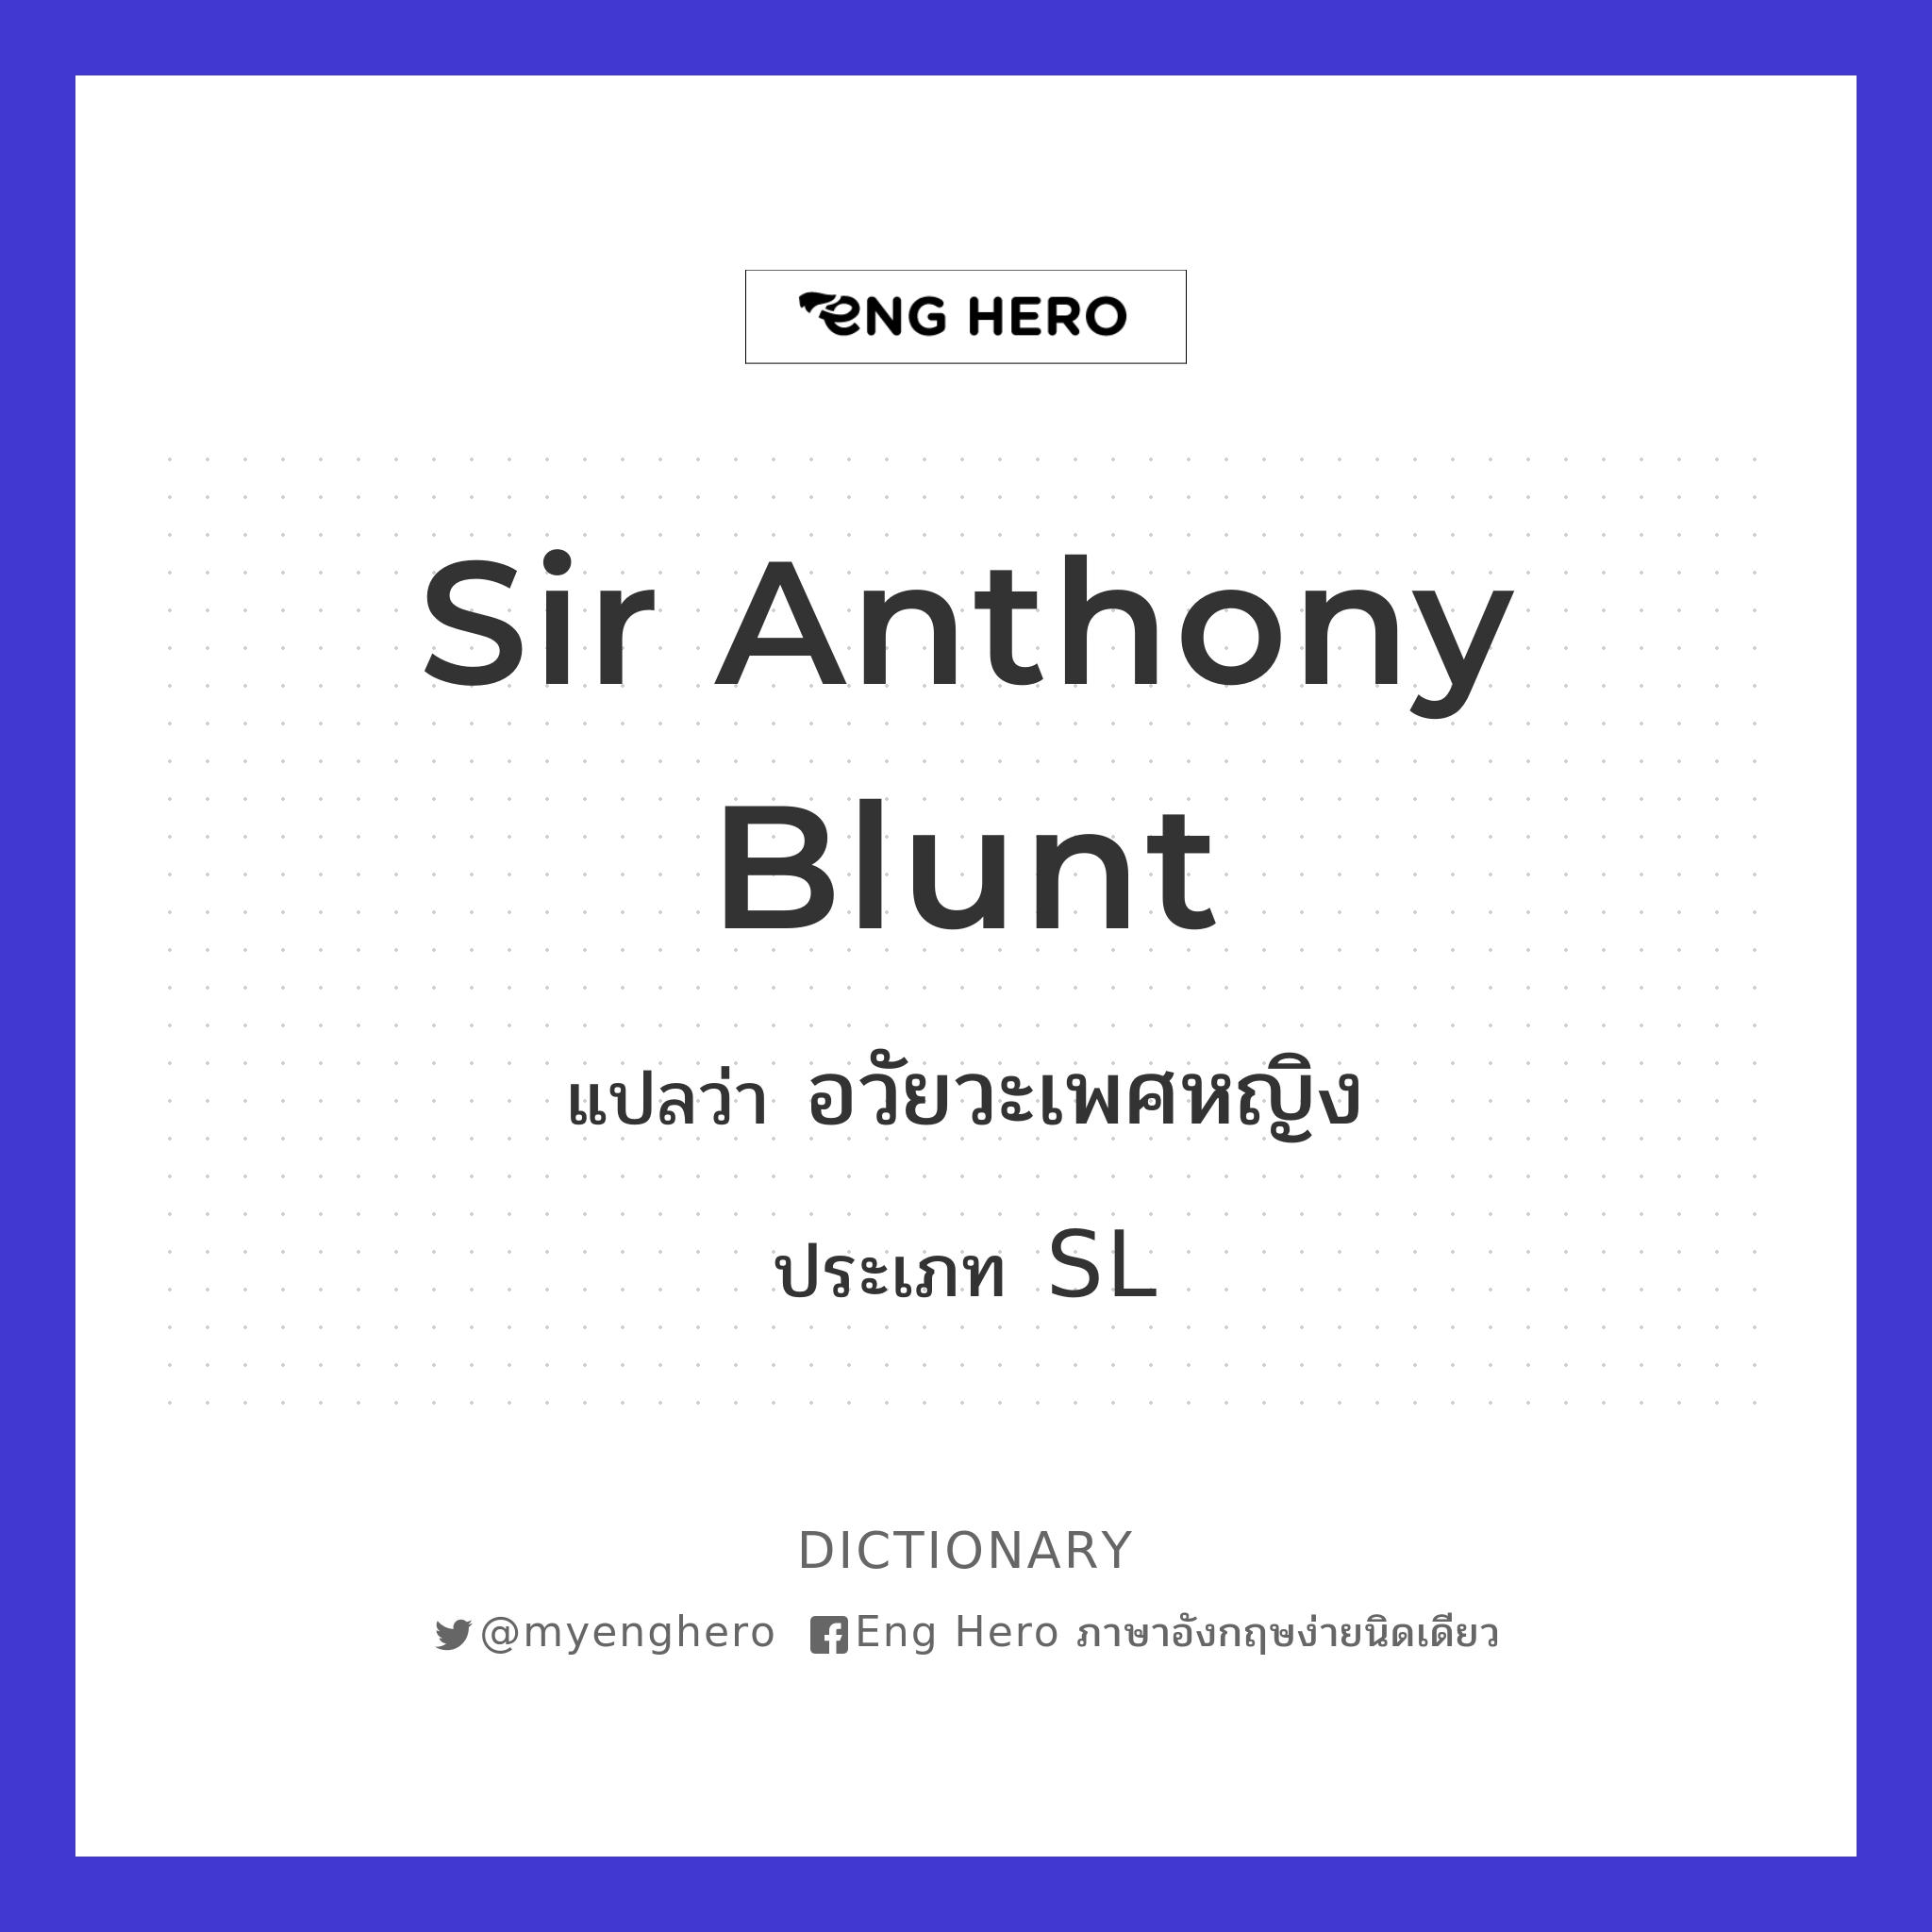 (Sir) Anthony Blunt